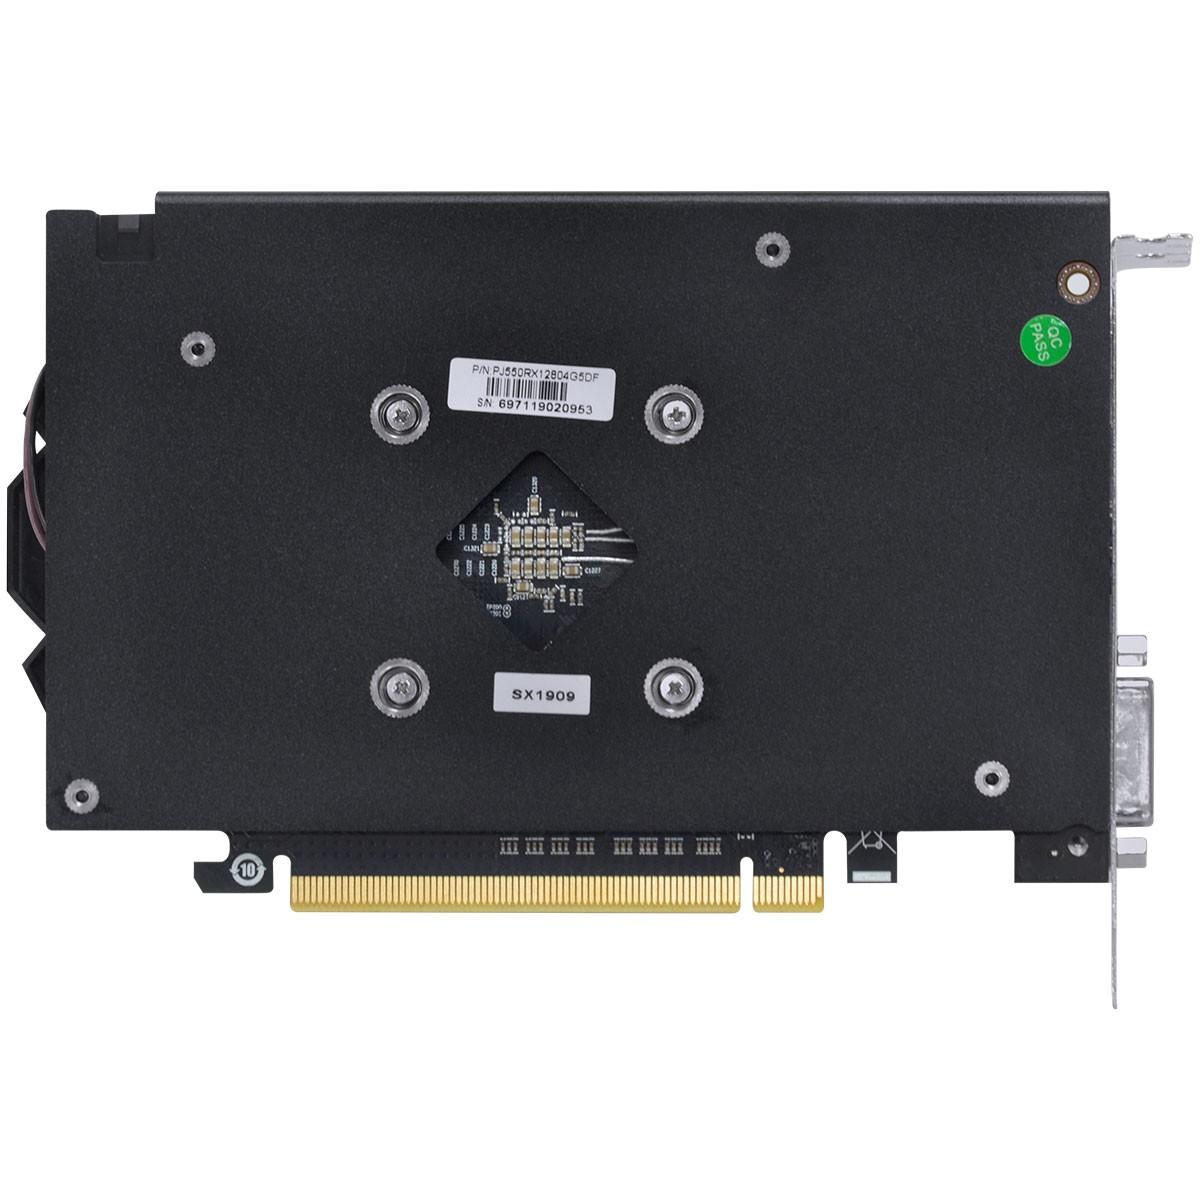 Placa de Vídeo PCyes Radeon RX 550 Graffiti Series, 4GB GDDR5, 128Bit